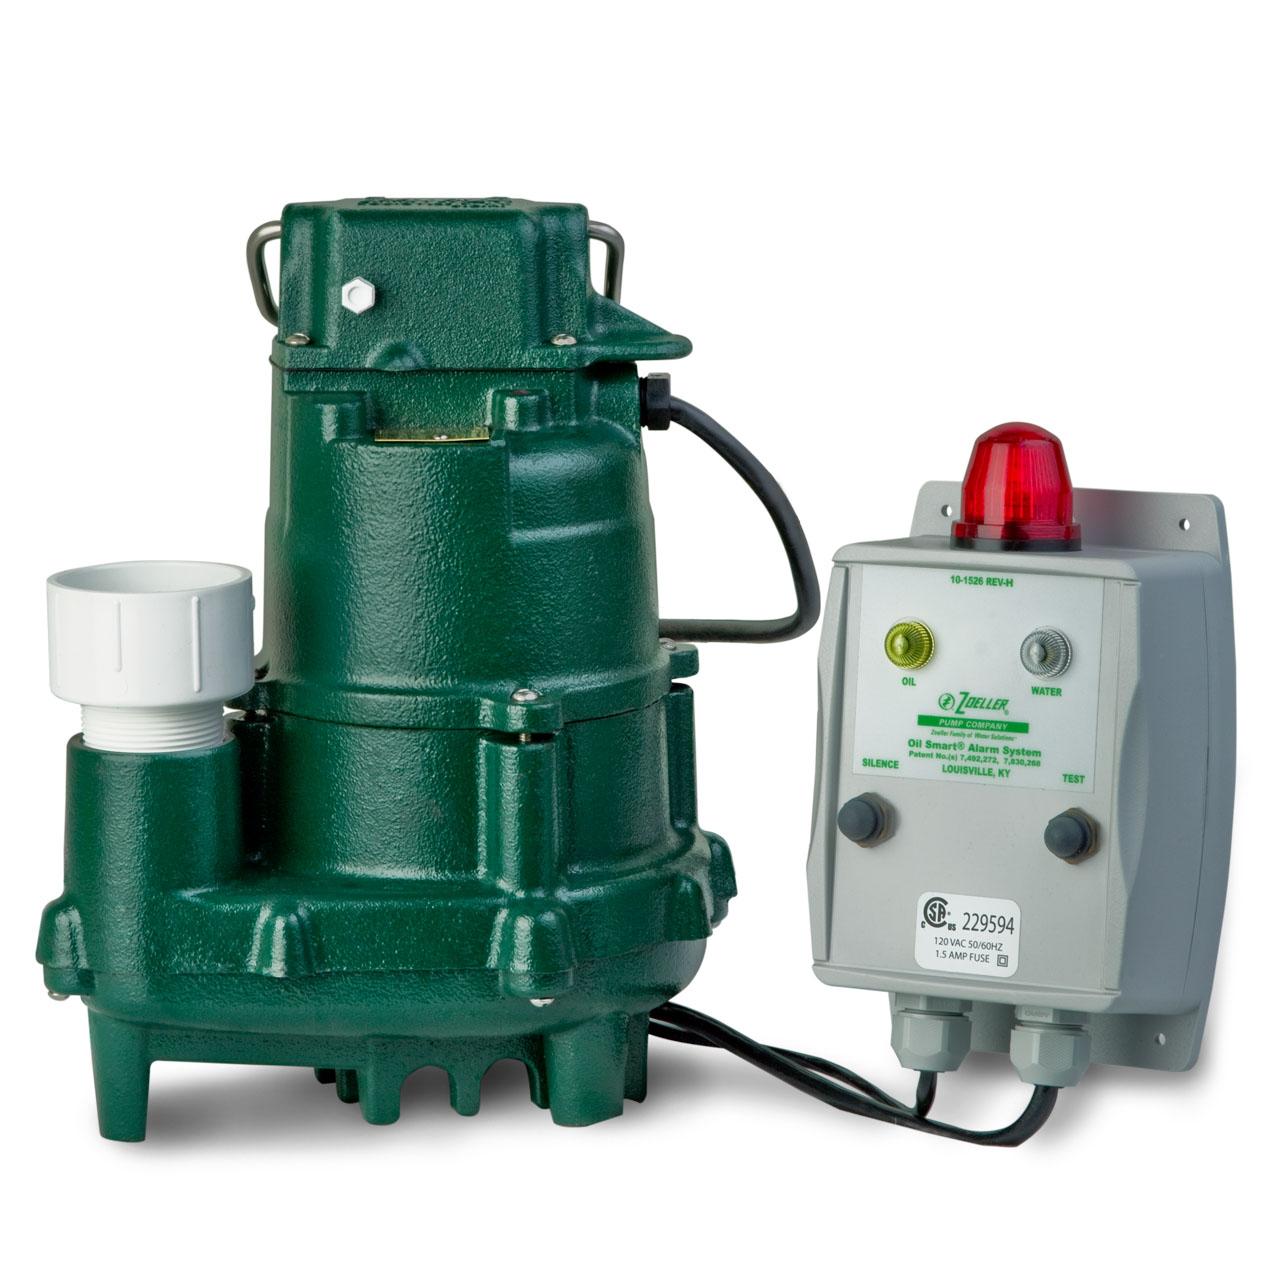 hight resolution of zoeller pump switch wiring diagram wiring library zoeller pump switch wiring diagram zoeller pump wiring